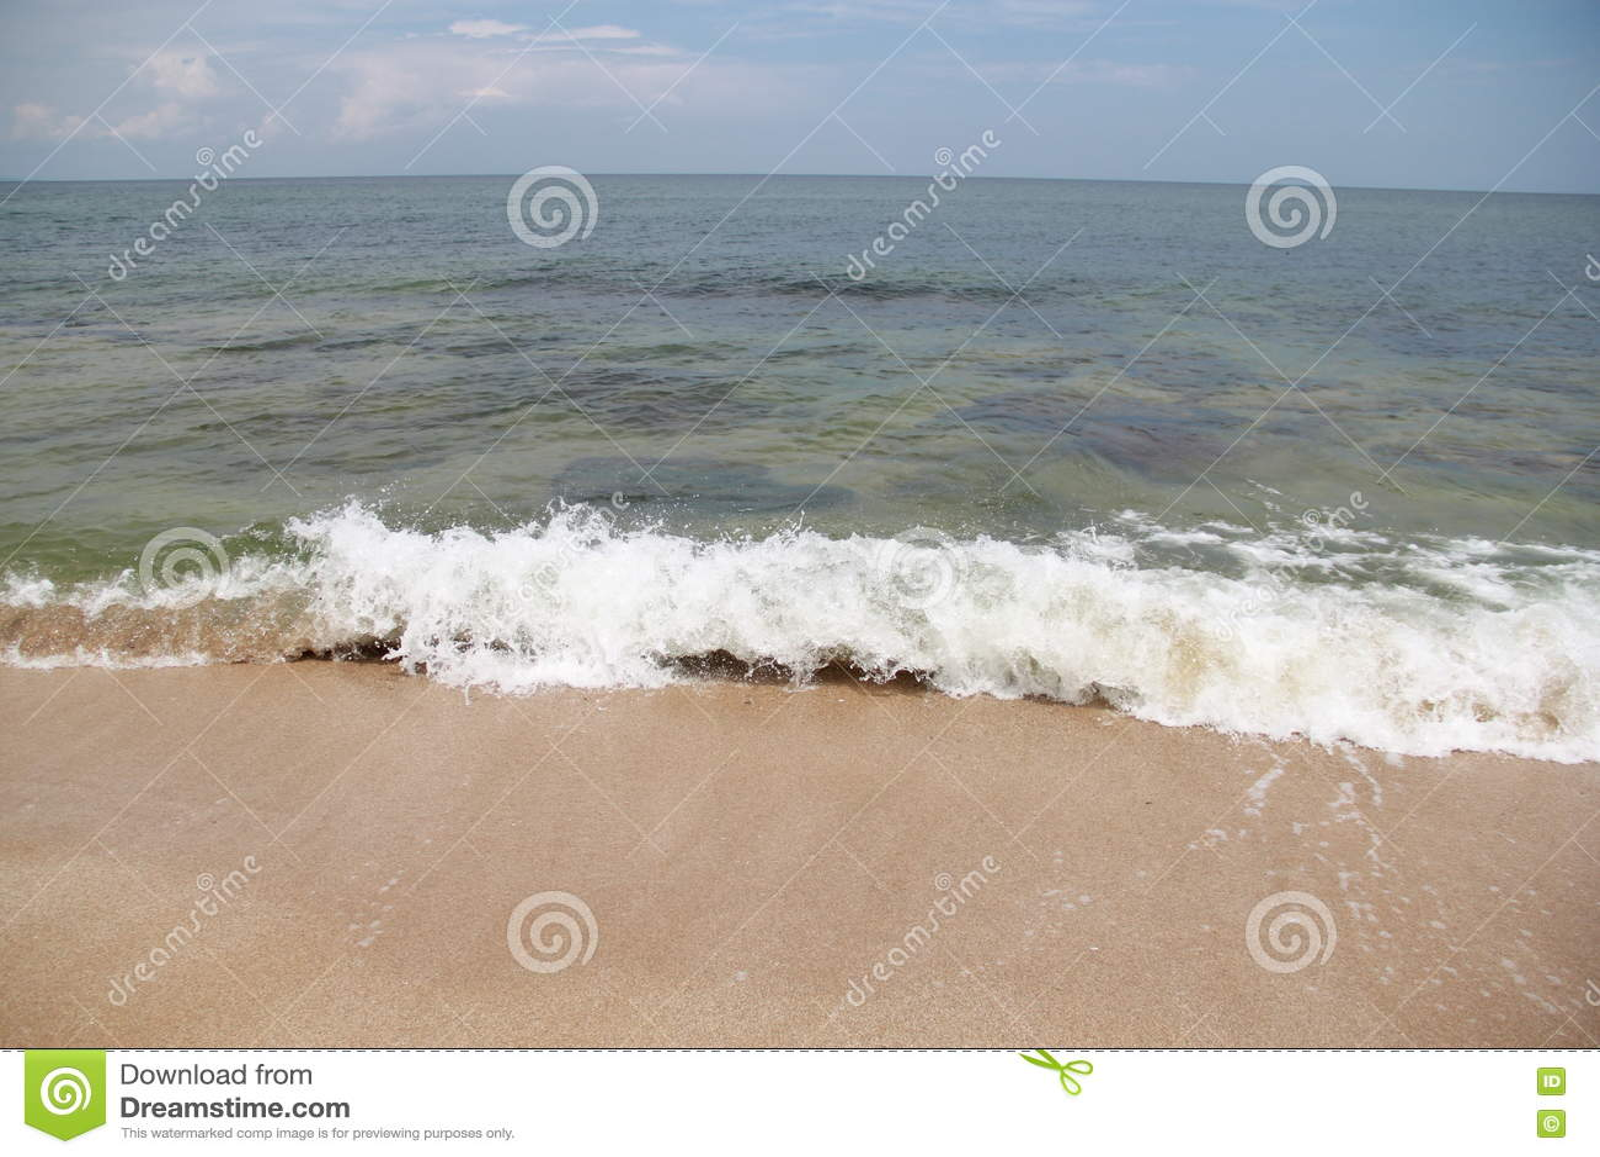 Mar, arena, onda, año 2014